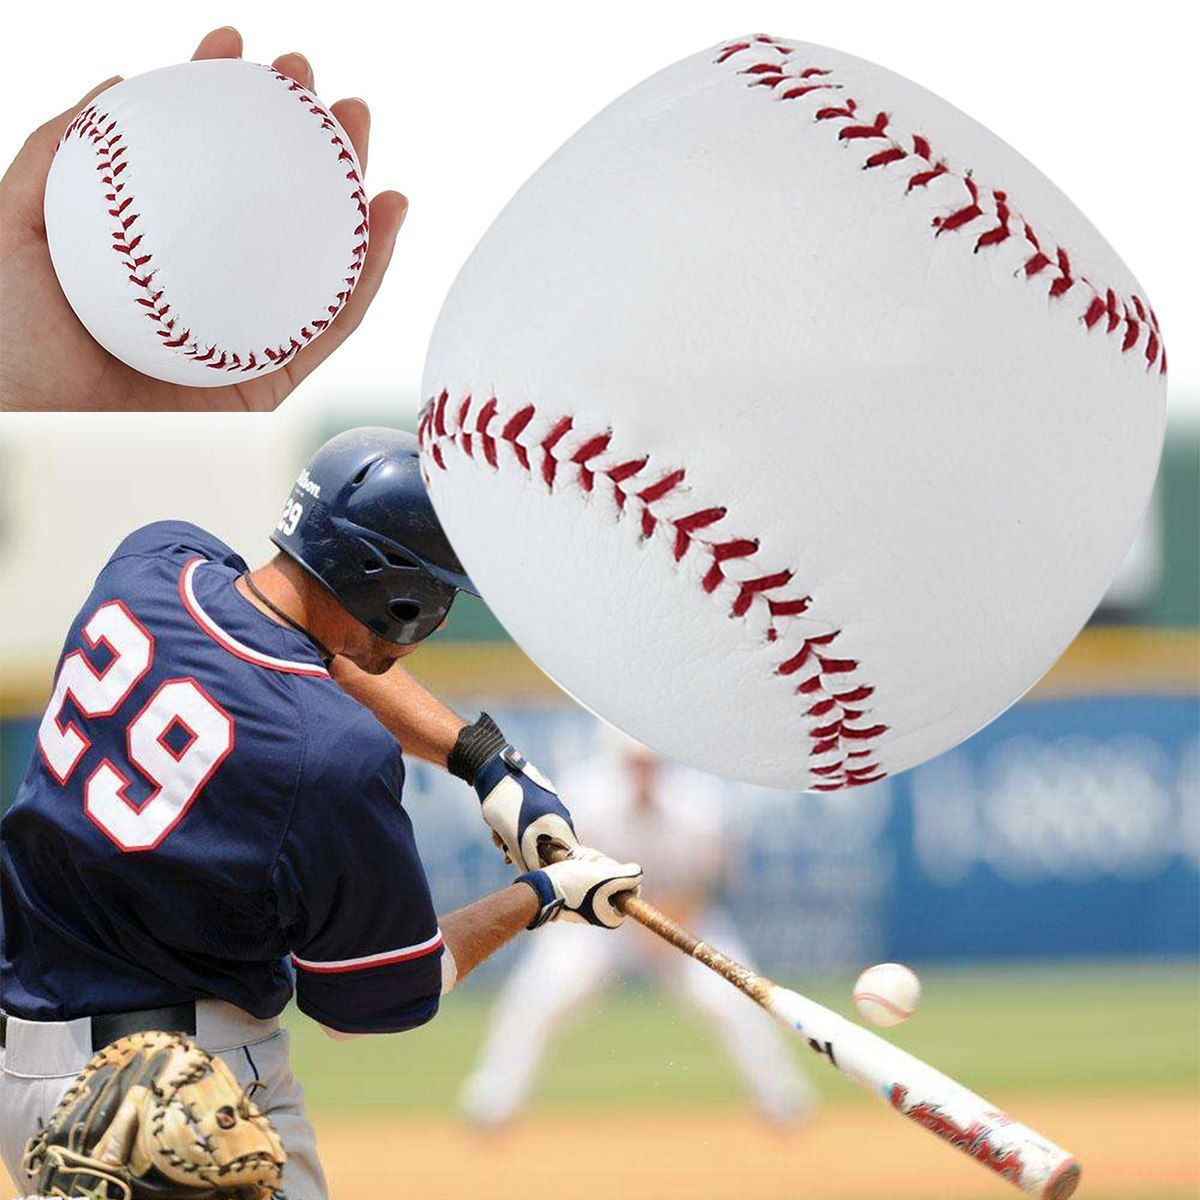 Mayitr Skilled 10 Inch Baseball Sport Recreation White Pu Base Ball Apply Coaching Softball Hand Stitching Sport Group Recreation Dengan Gambar